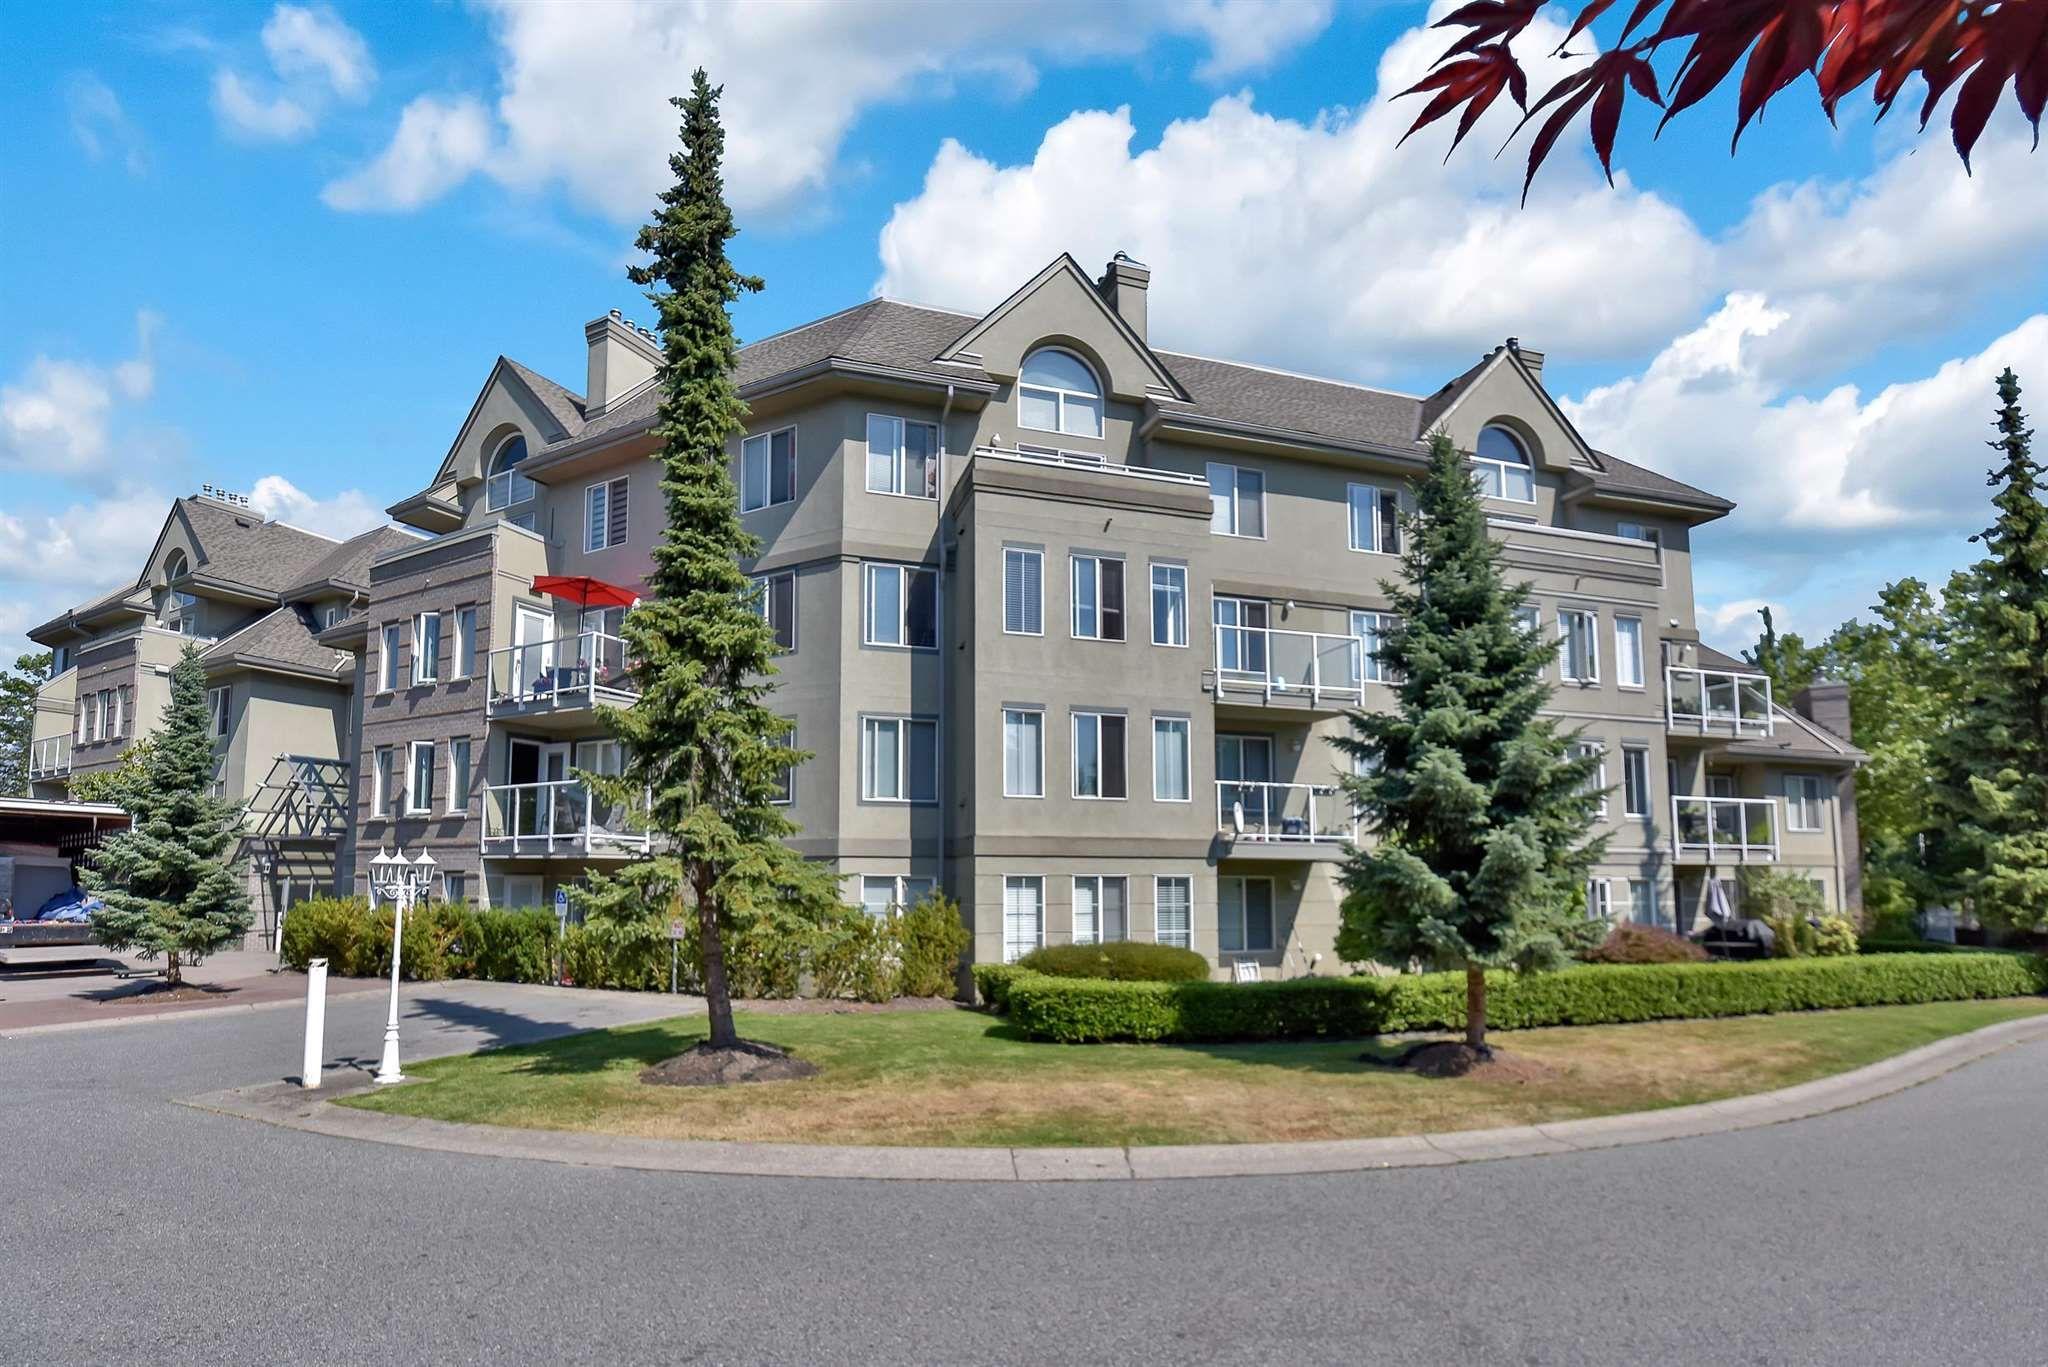 Main Photo: 202 12125 75A Avenue in Surrey: West Newton Condo for sale : MLS®# R2597186